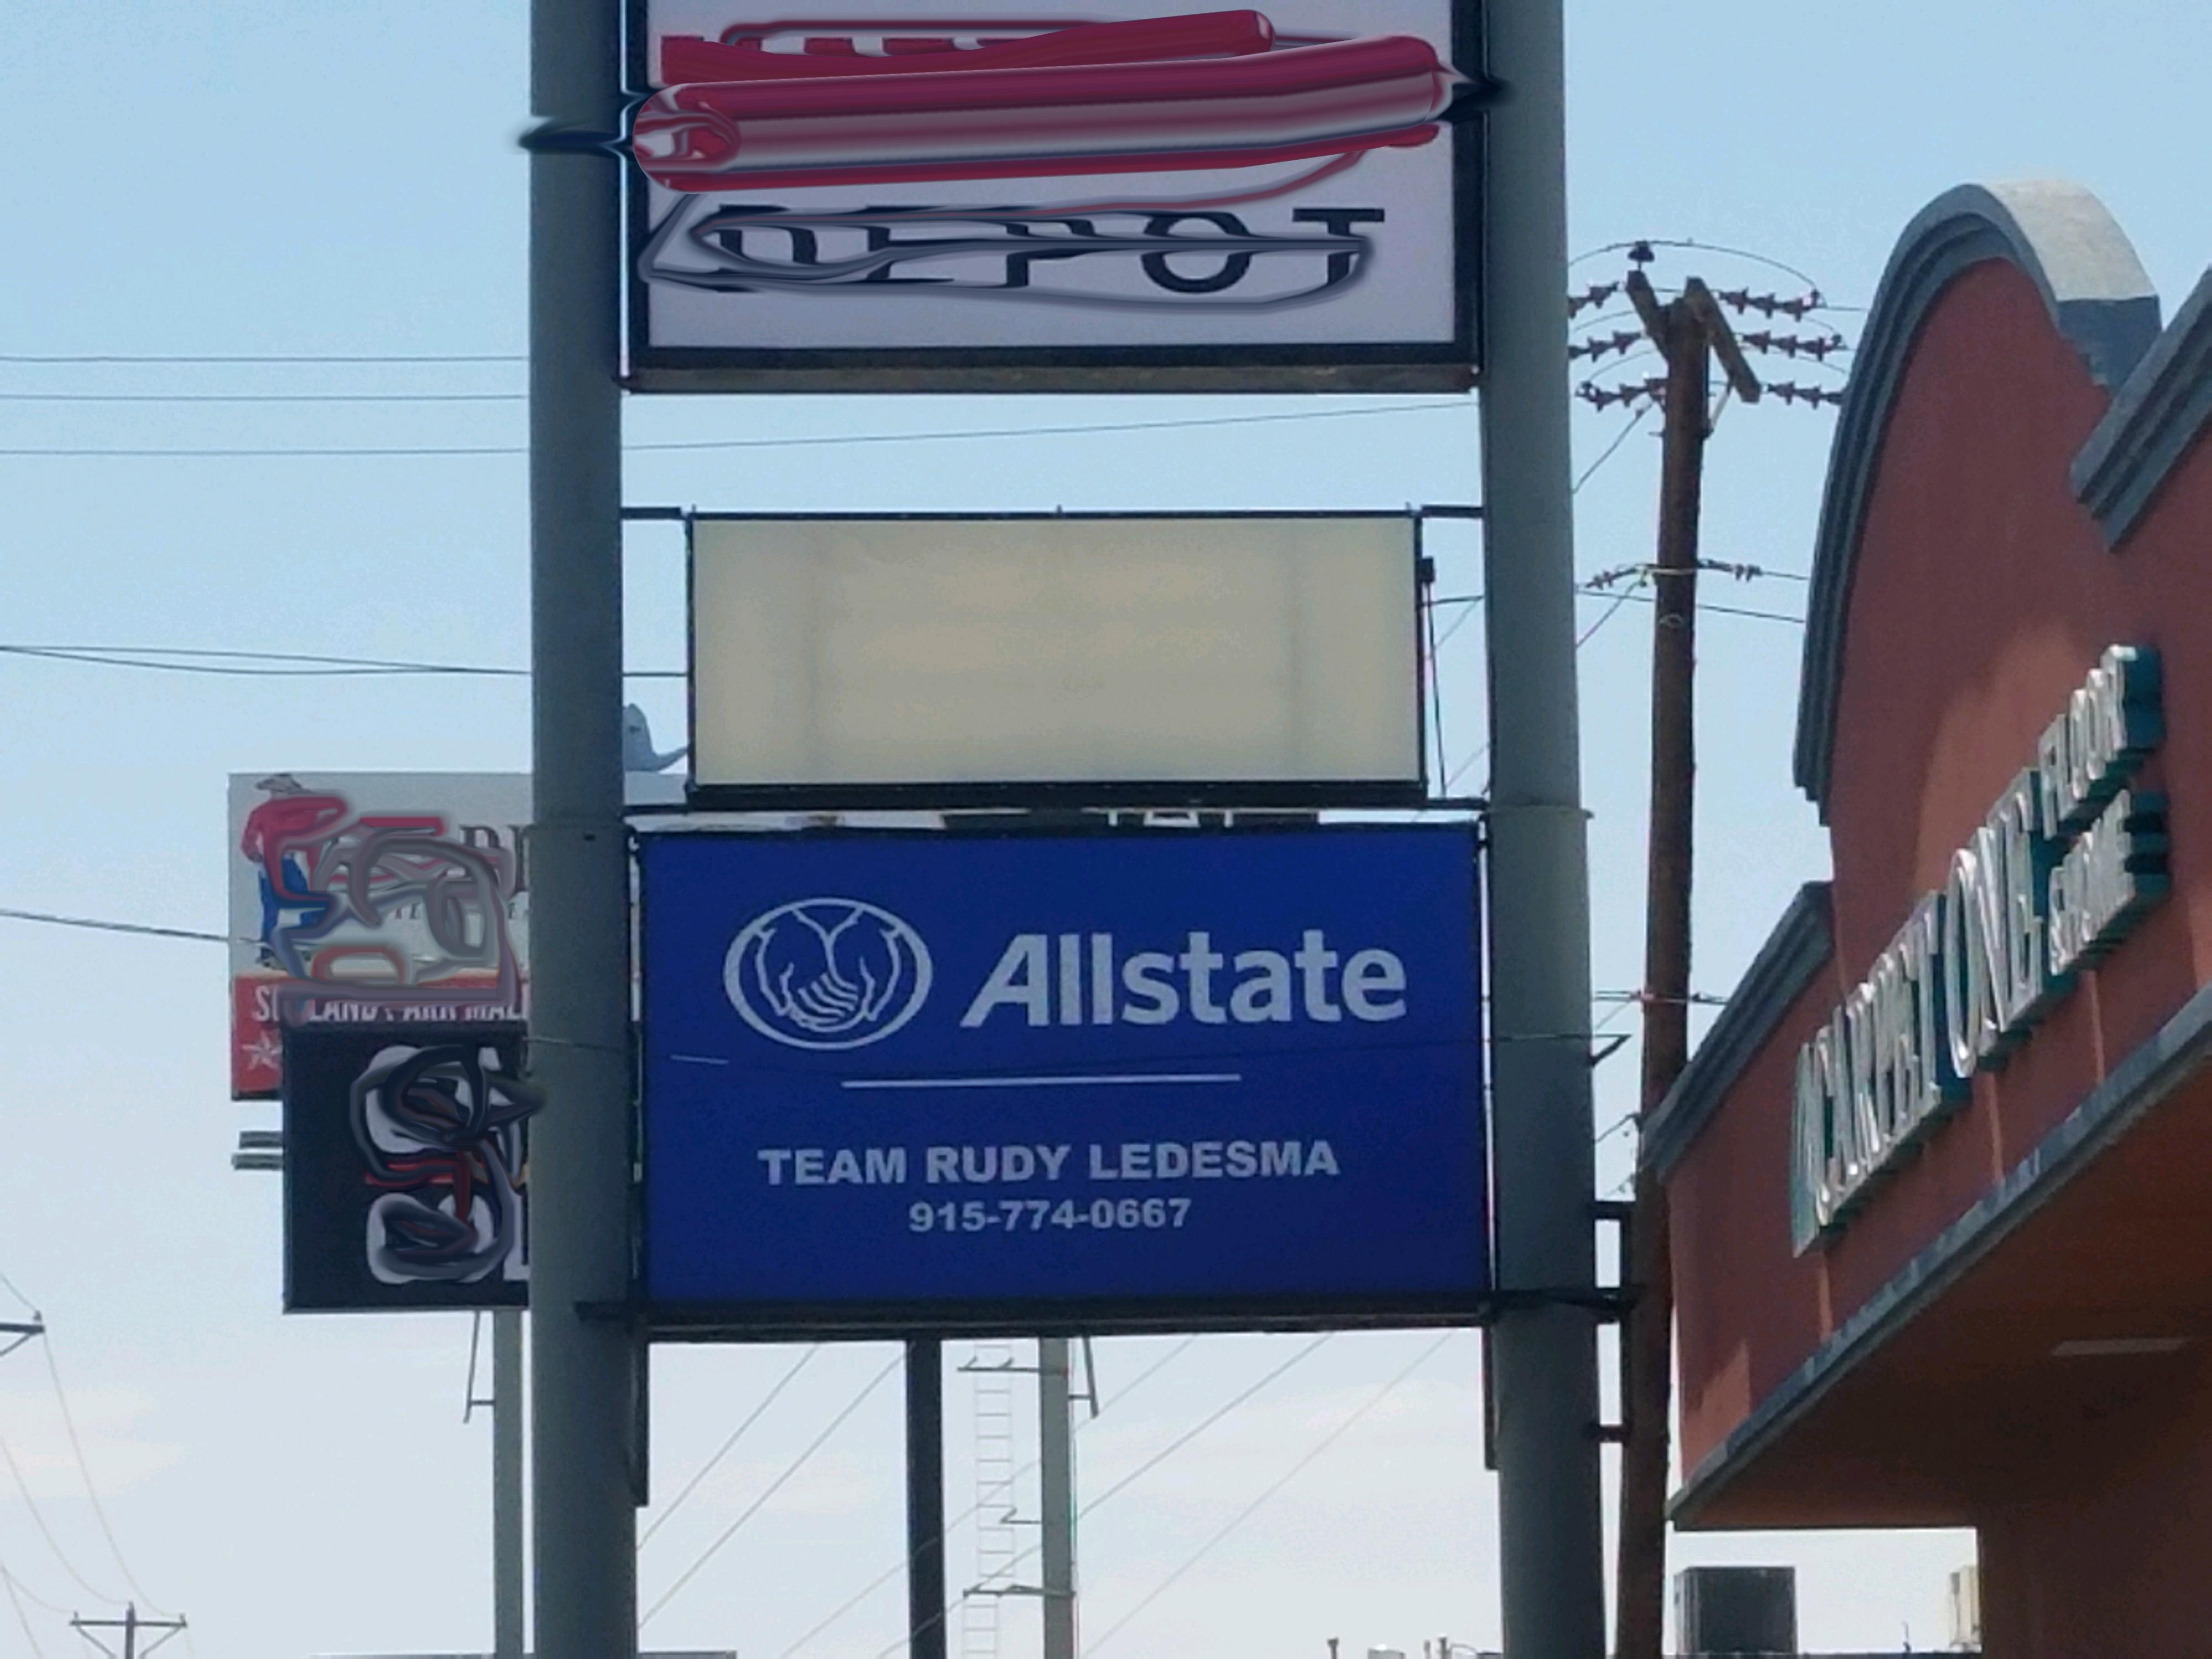 Team Rudy Ledesma Insurance Agency: Allstate Insurance image 7